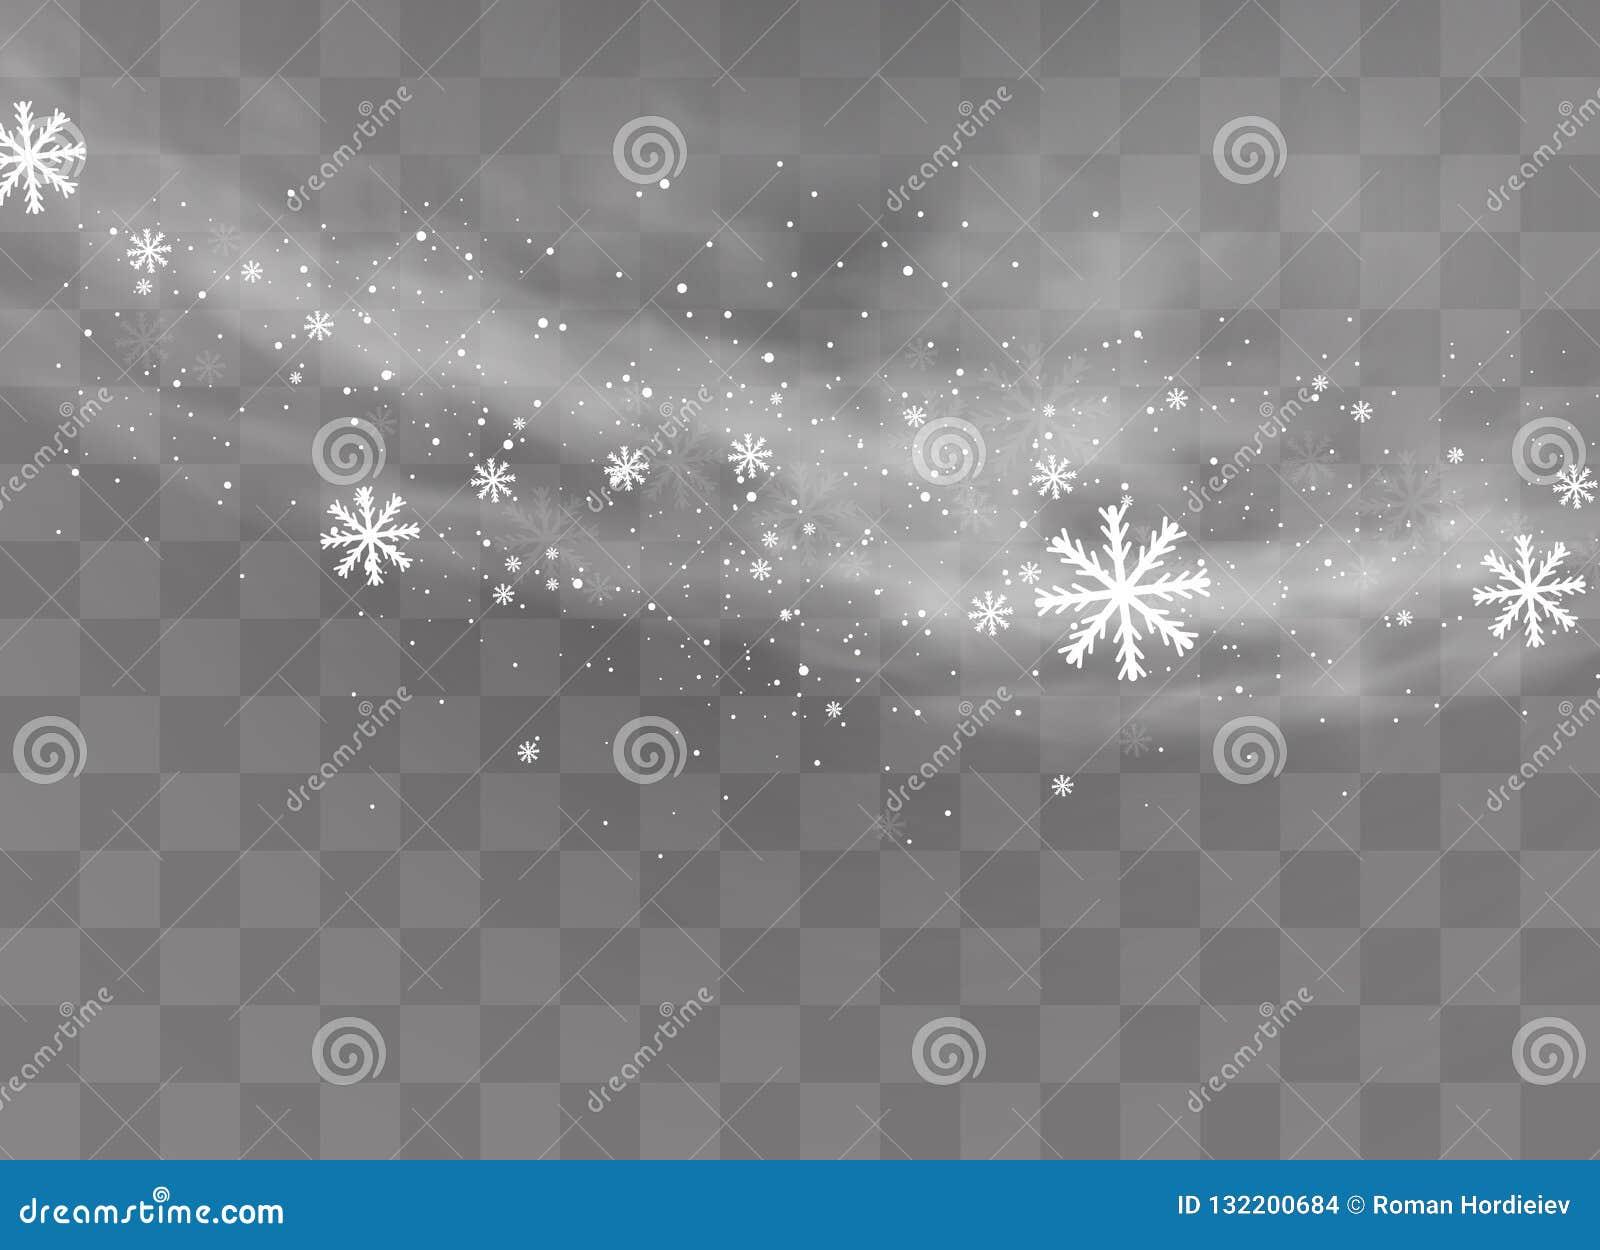 Предпосылка снега прозрачная